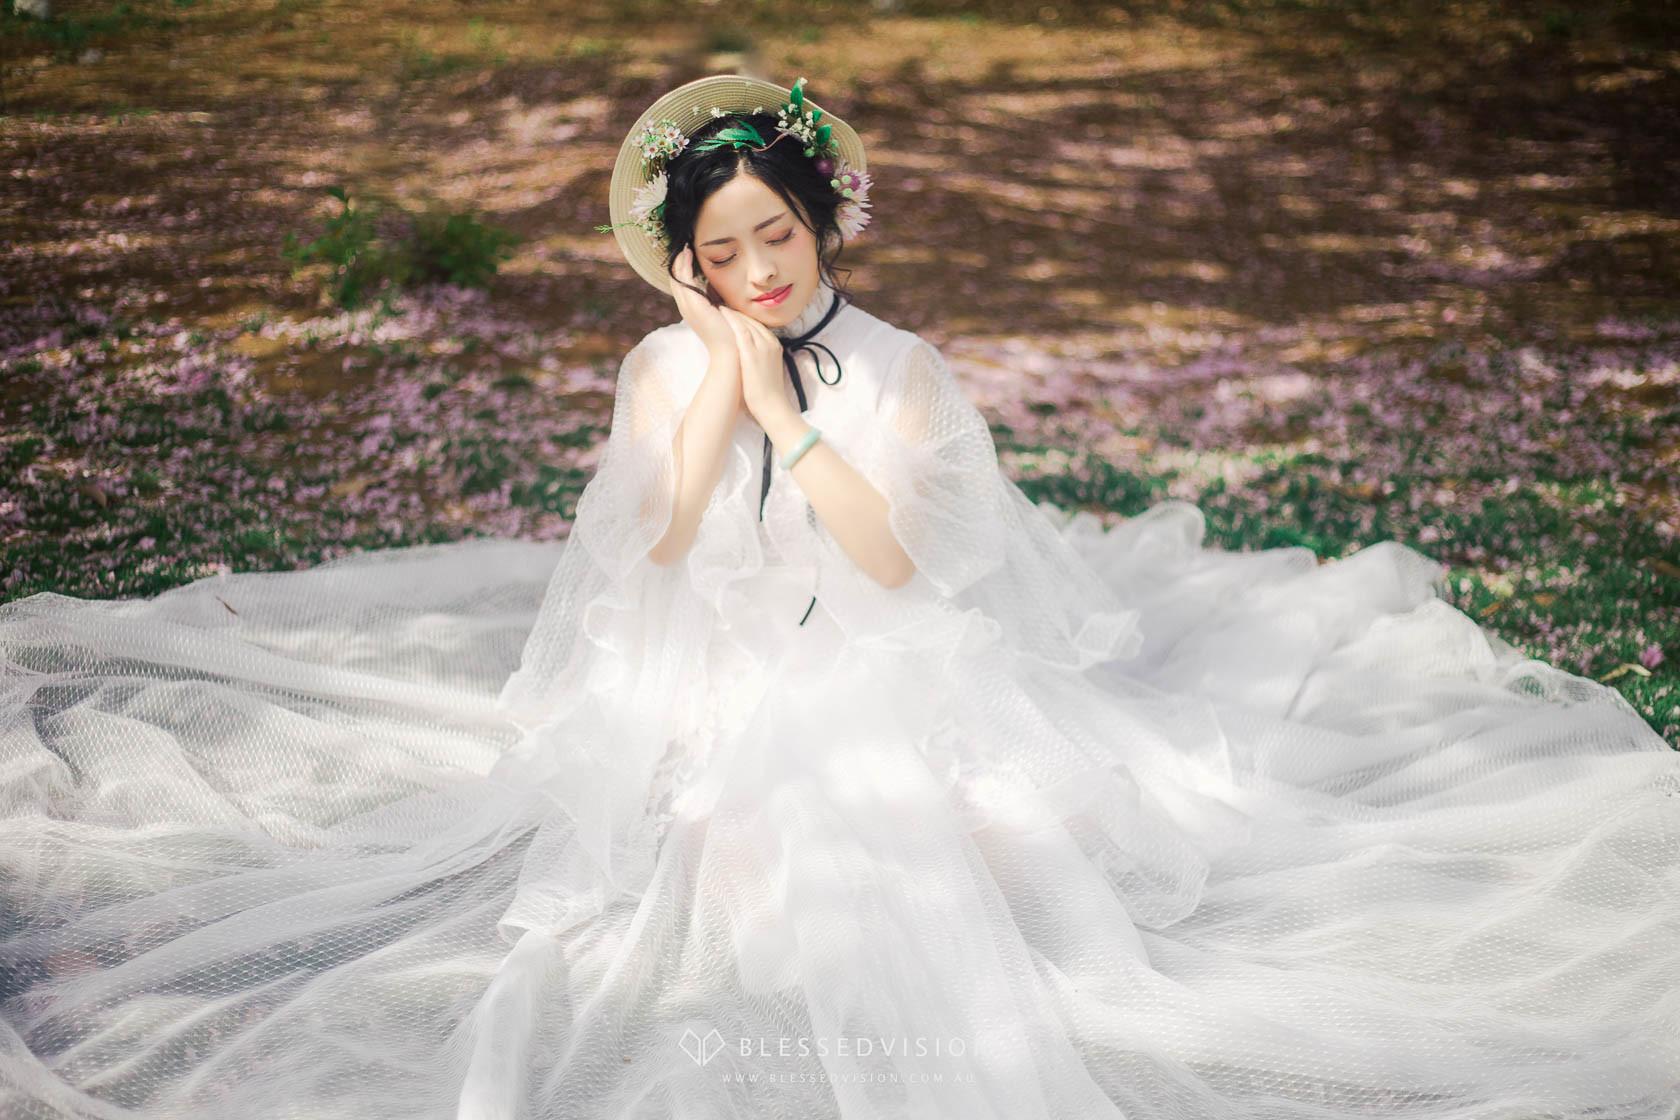 family baby newborn portrait photography Blessed Vision 人像摄影 宝宝照 棚拍 孕妇照 中国风 (33 of 37)